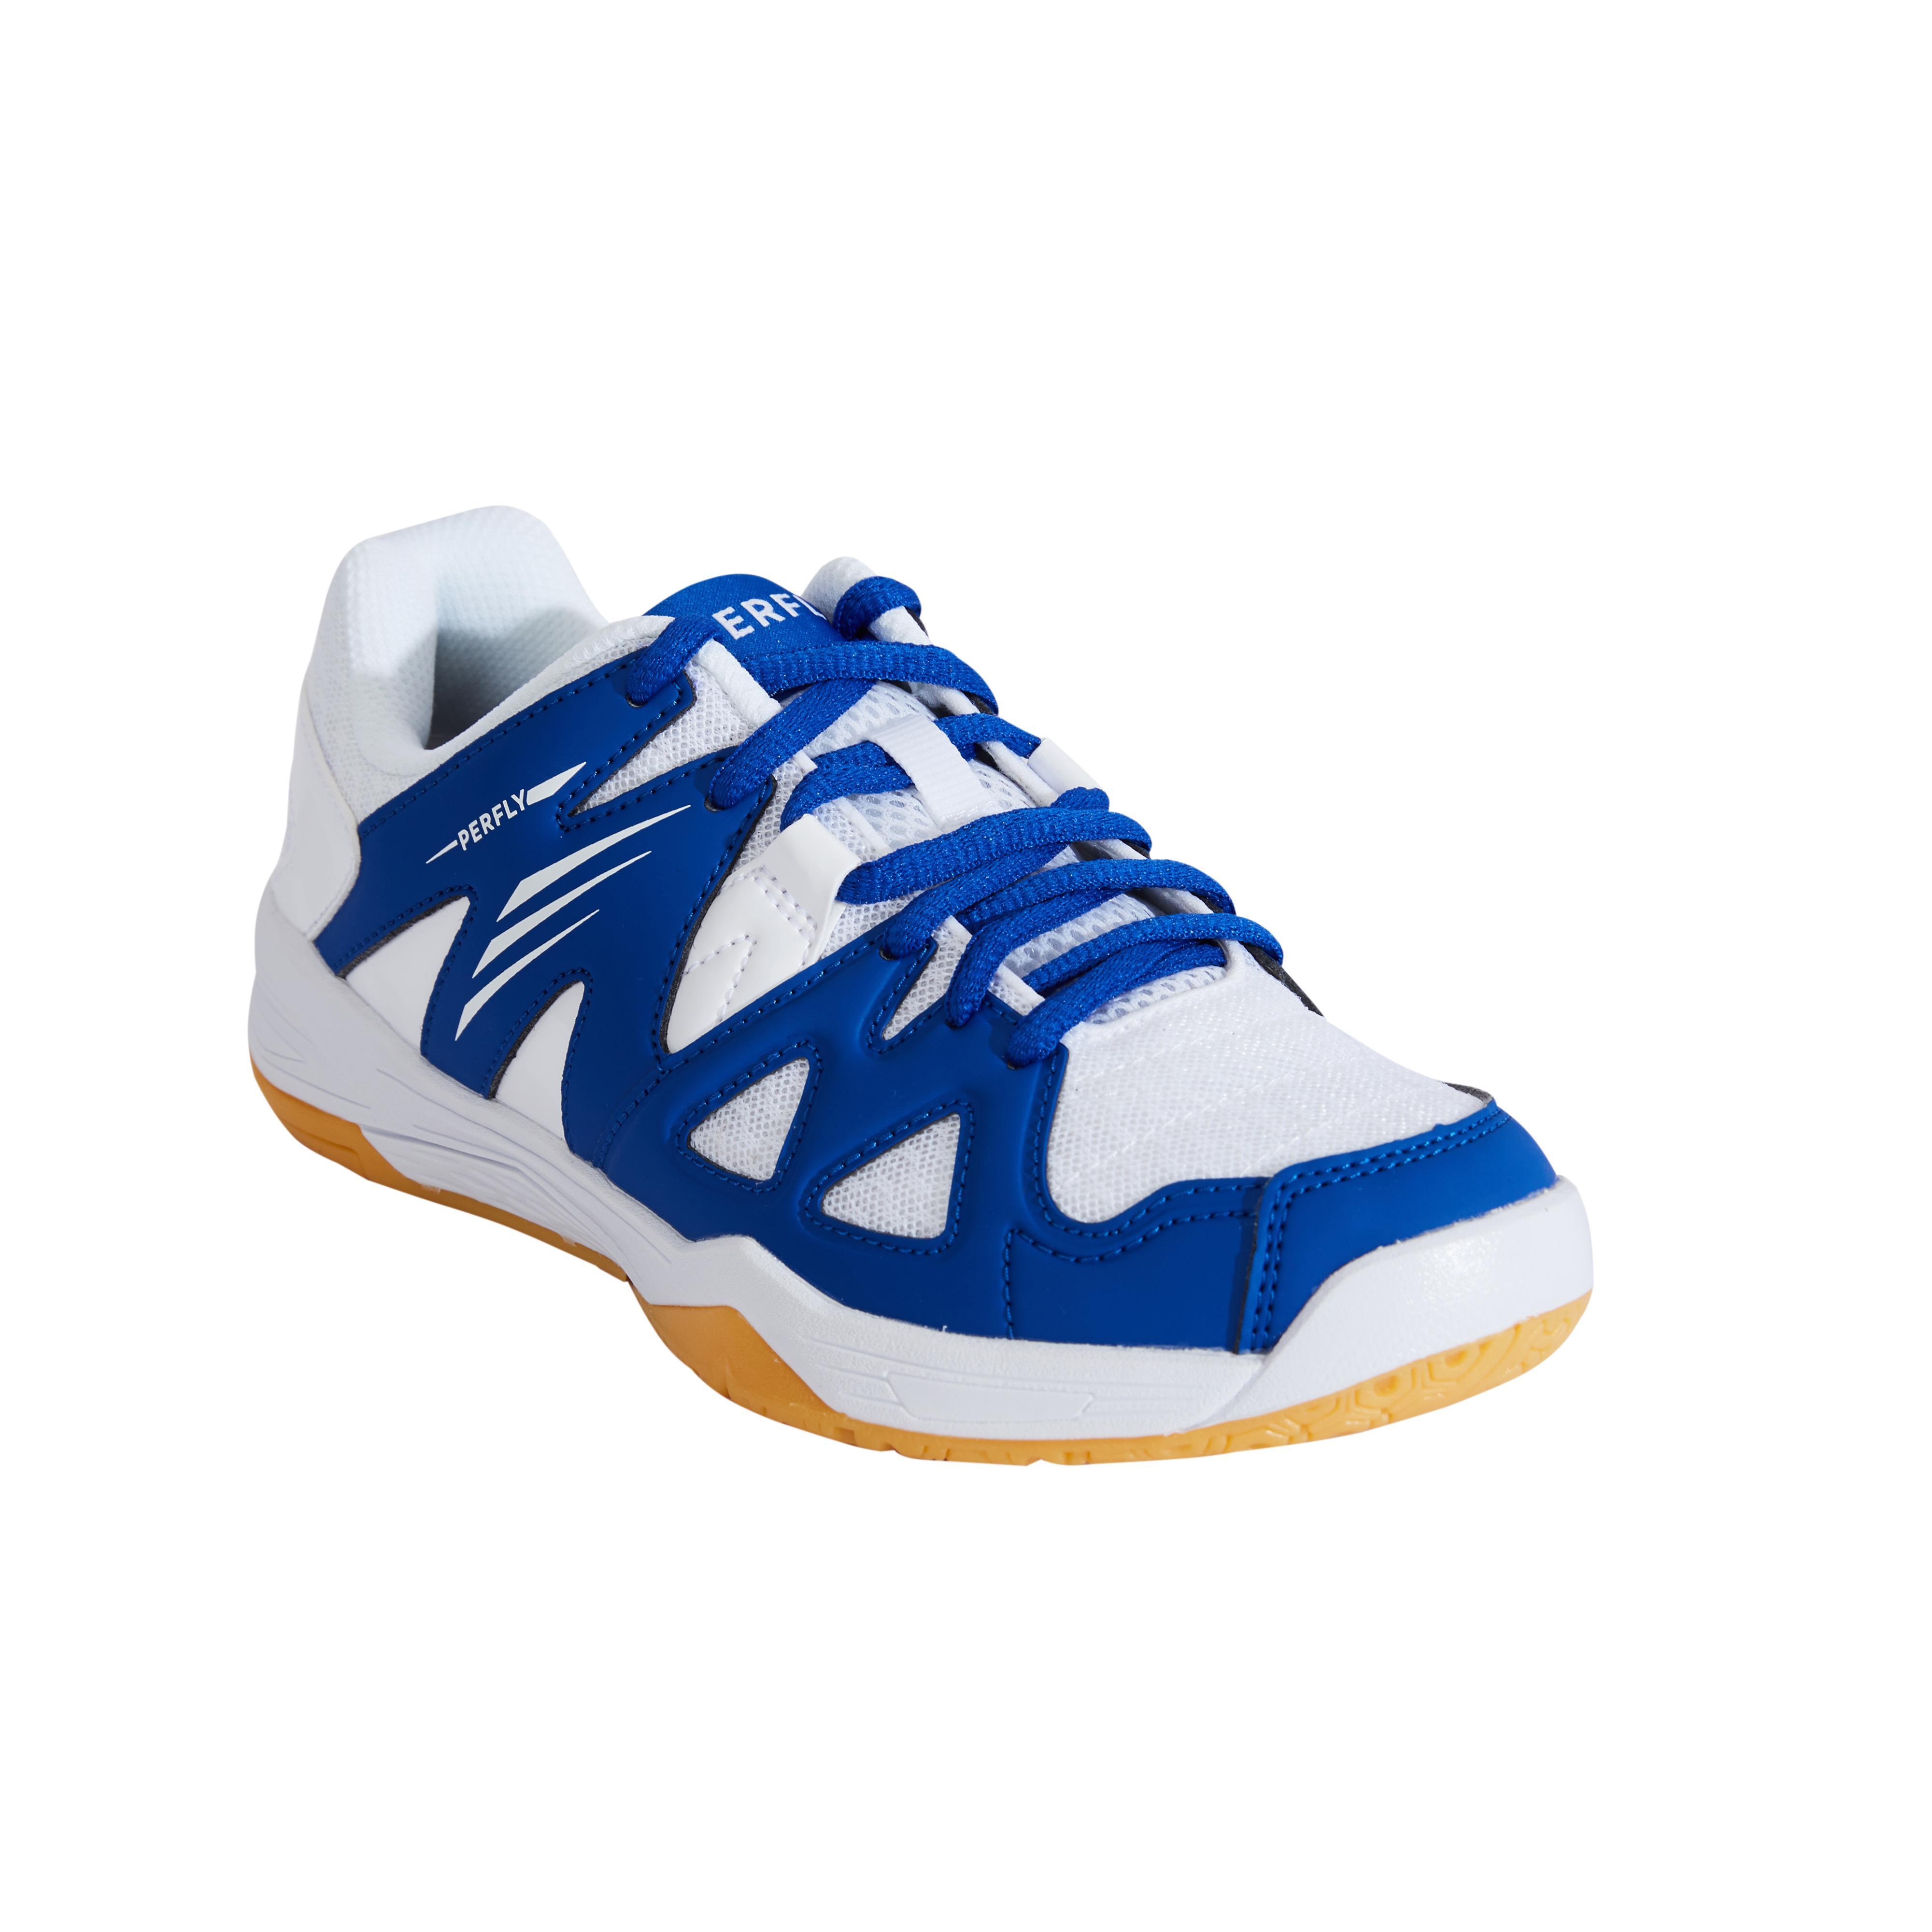 Perfly Chaussures De Badminton BS 500 Junior - Blanc/Bleu - Perfly